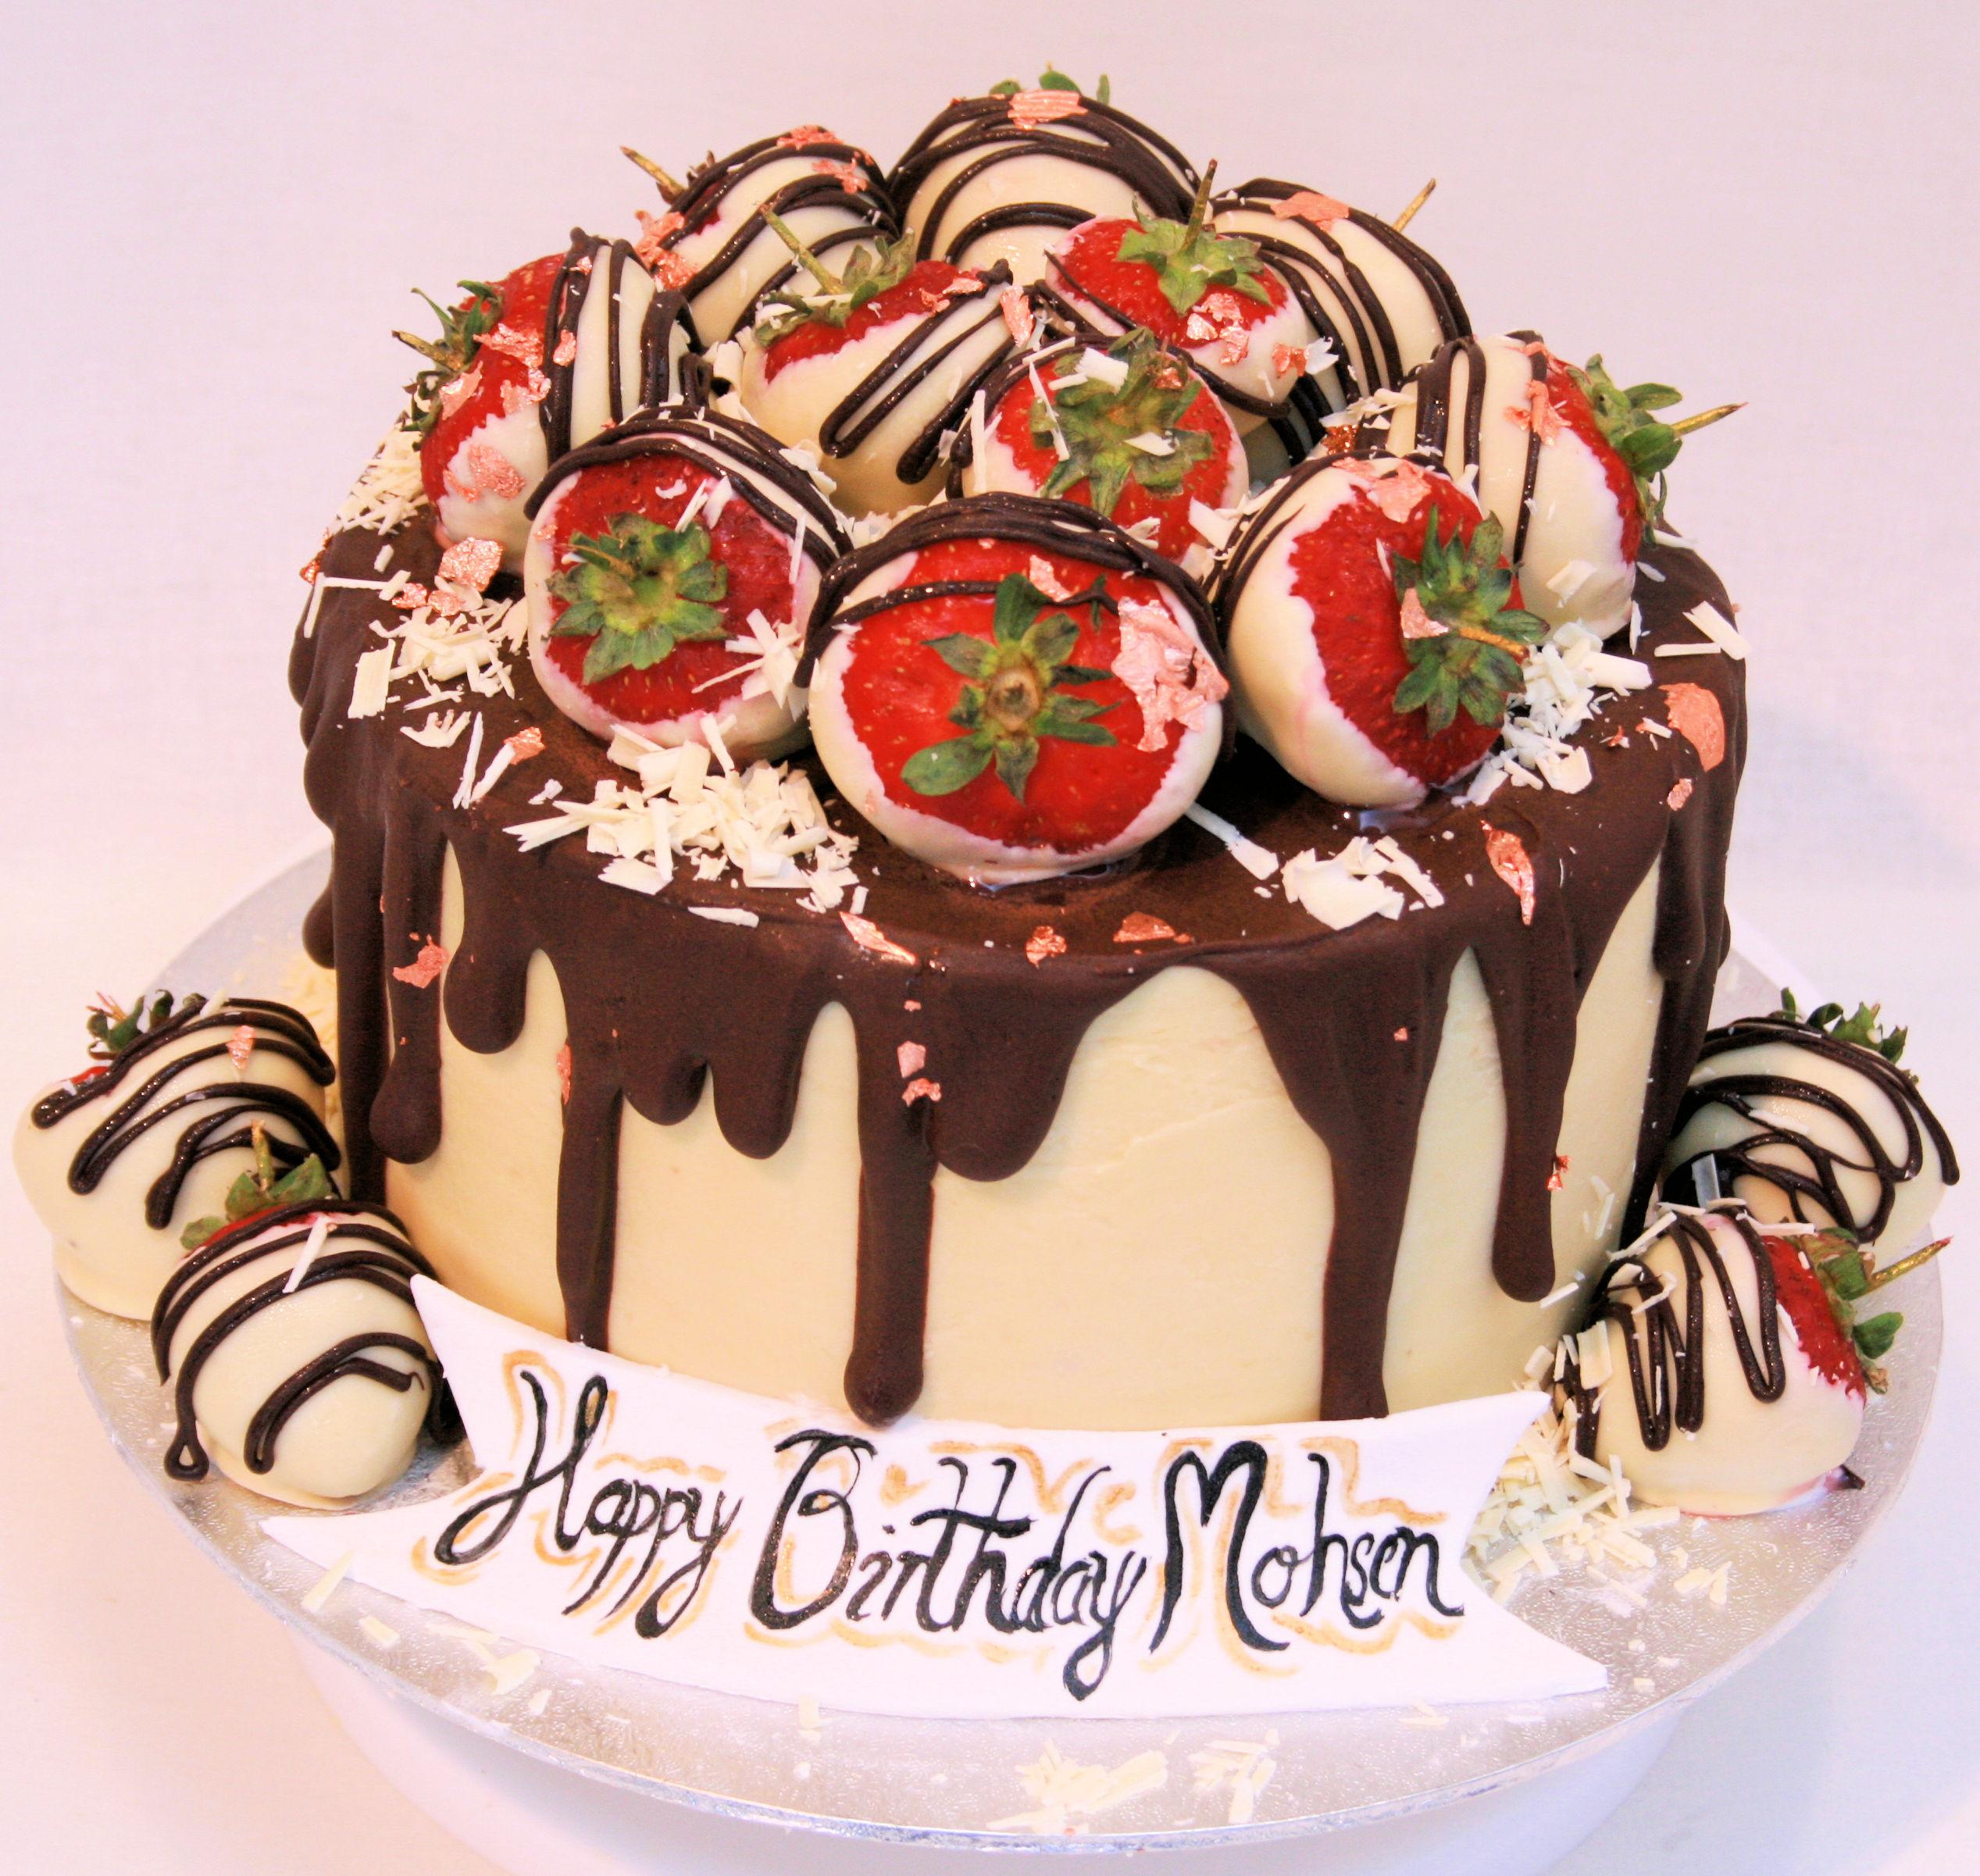 Peachy Cake Expectations Adult Birthday Cakes Cardiff Funny Birthday Cards Online Alyptdamsfinfo